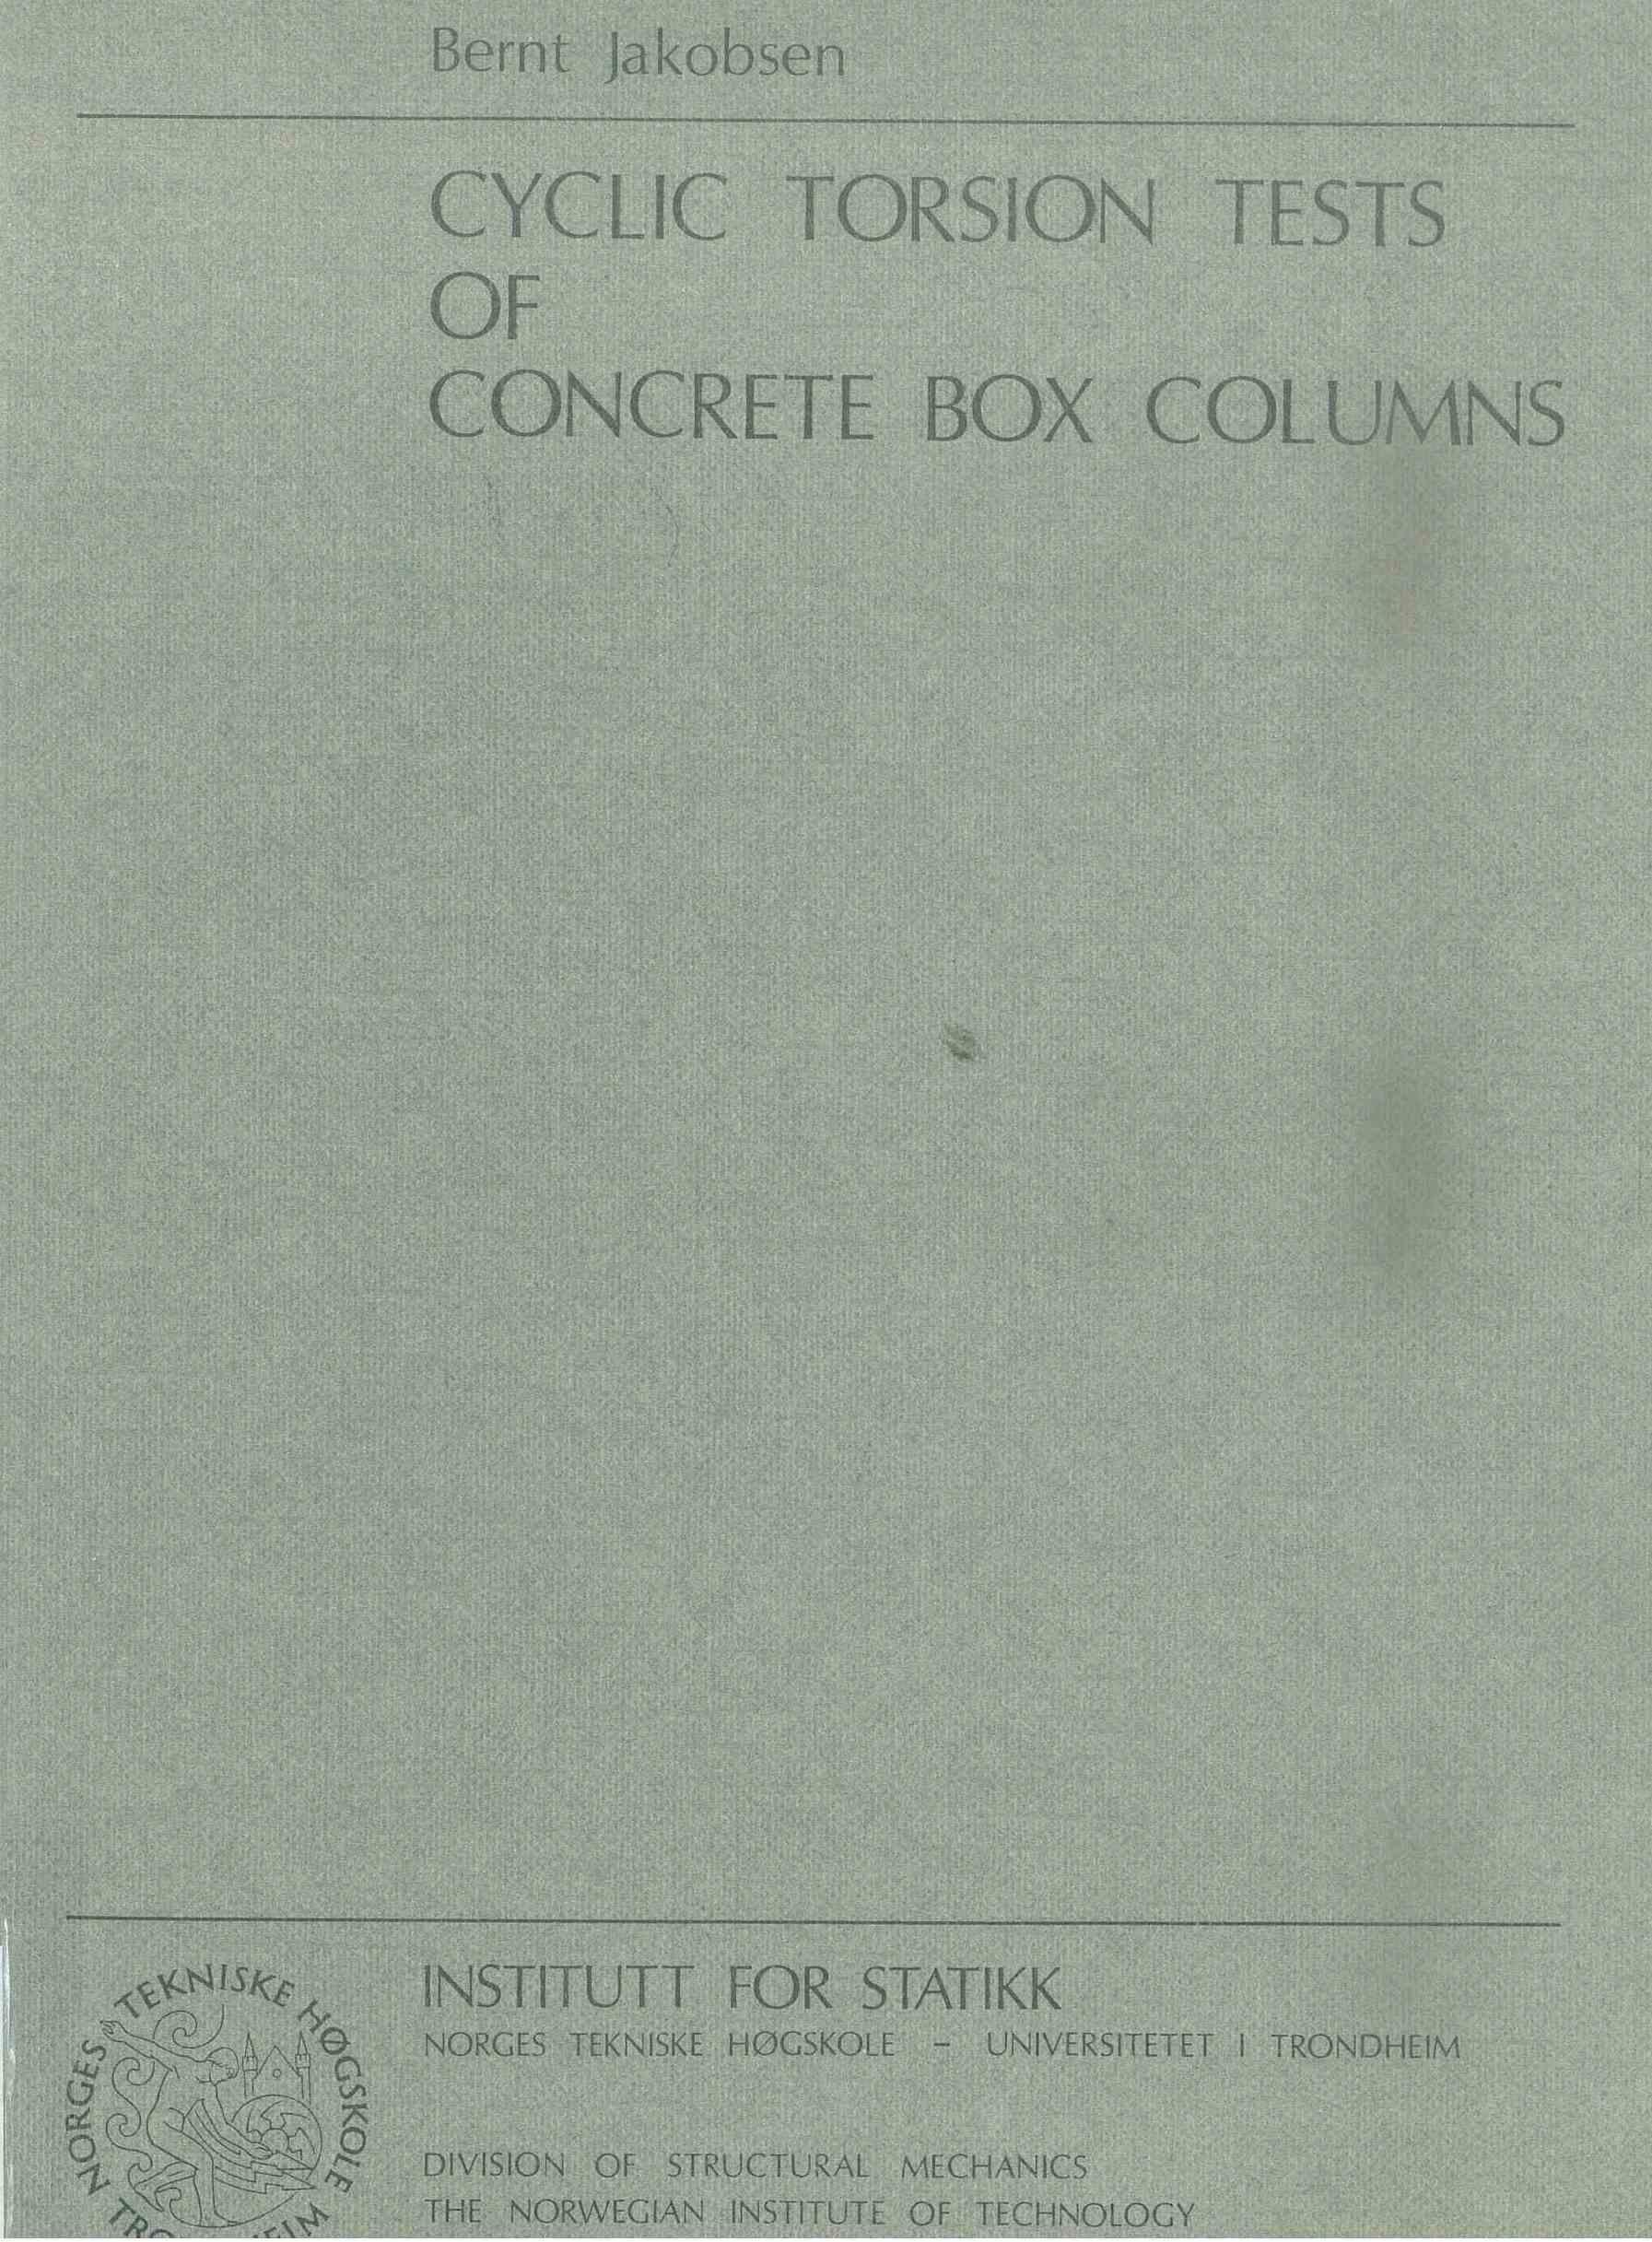 Cyclic Torsion Tests of Concrete Box Columns